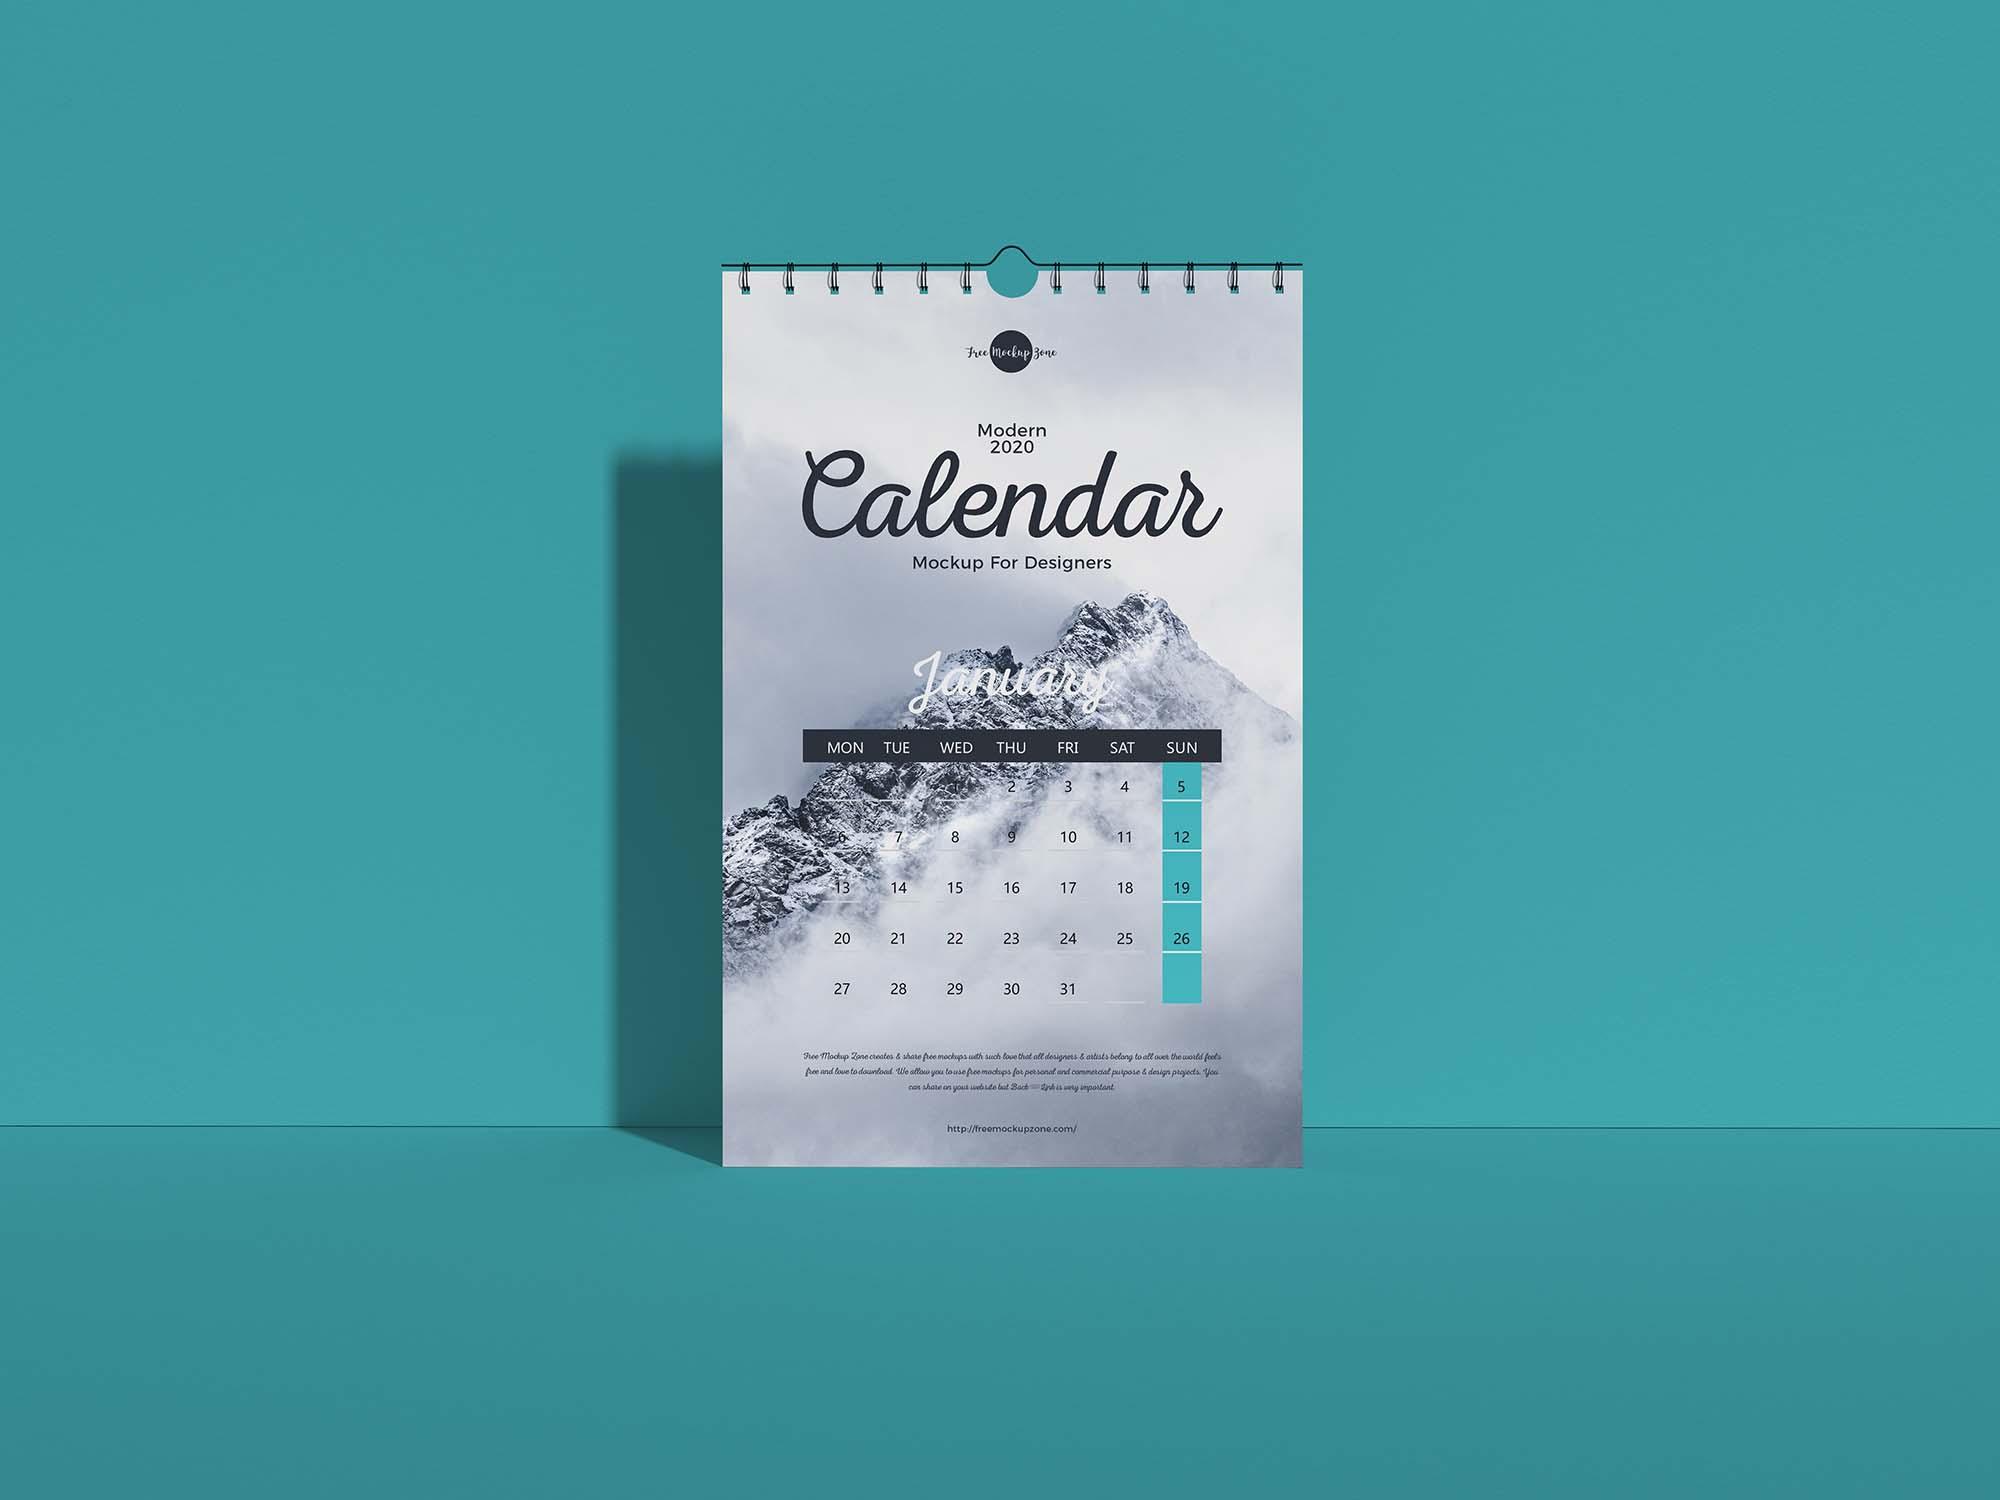 Wall Calendar Mockup 2